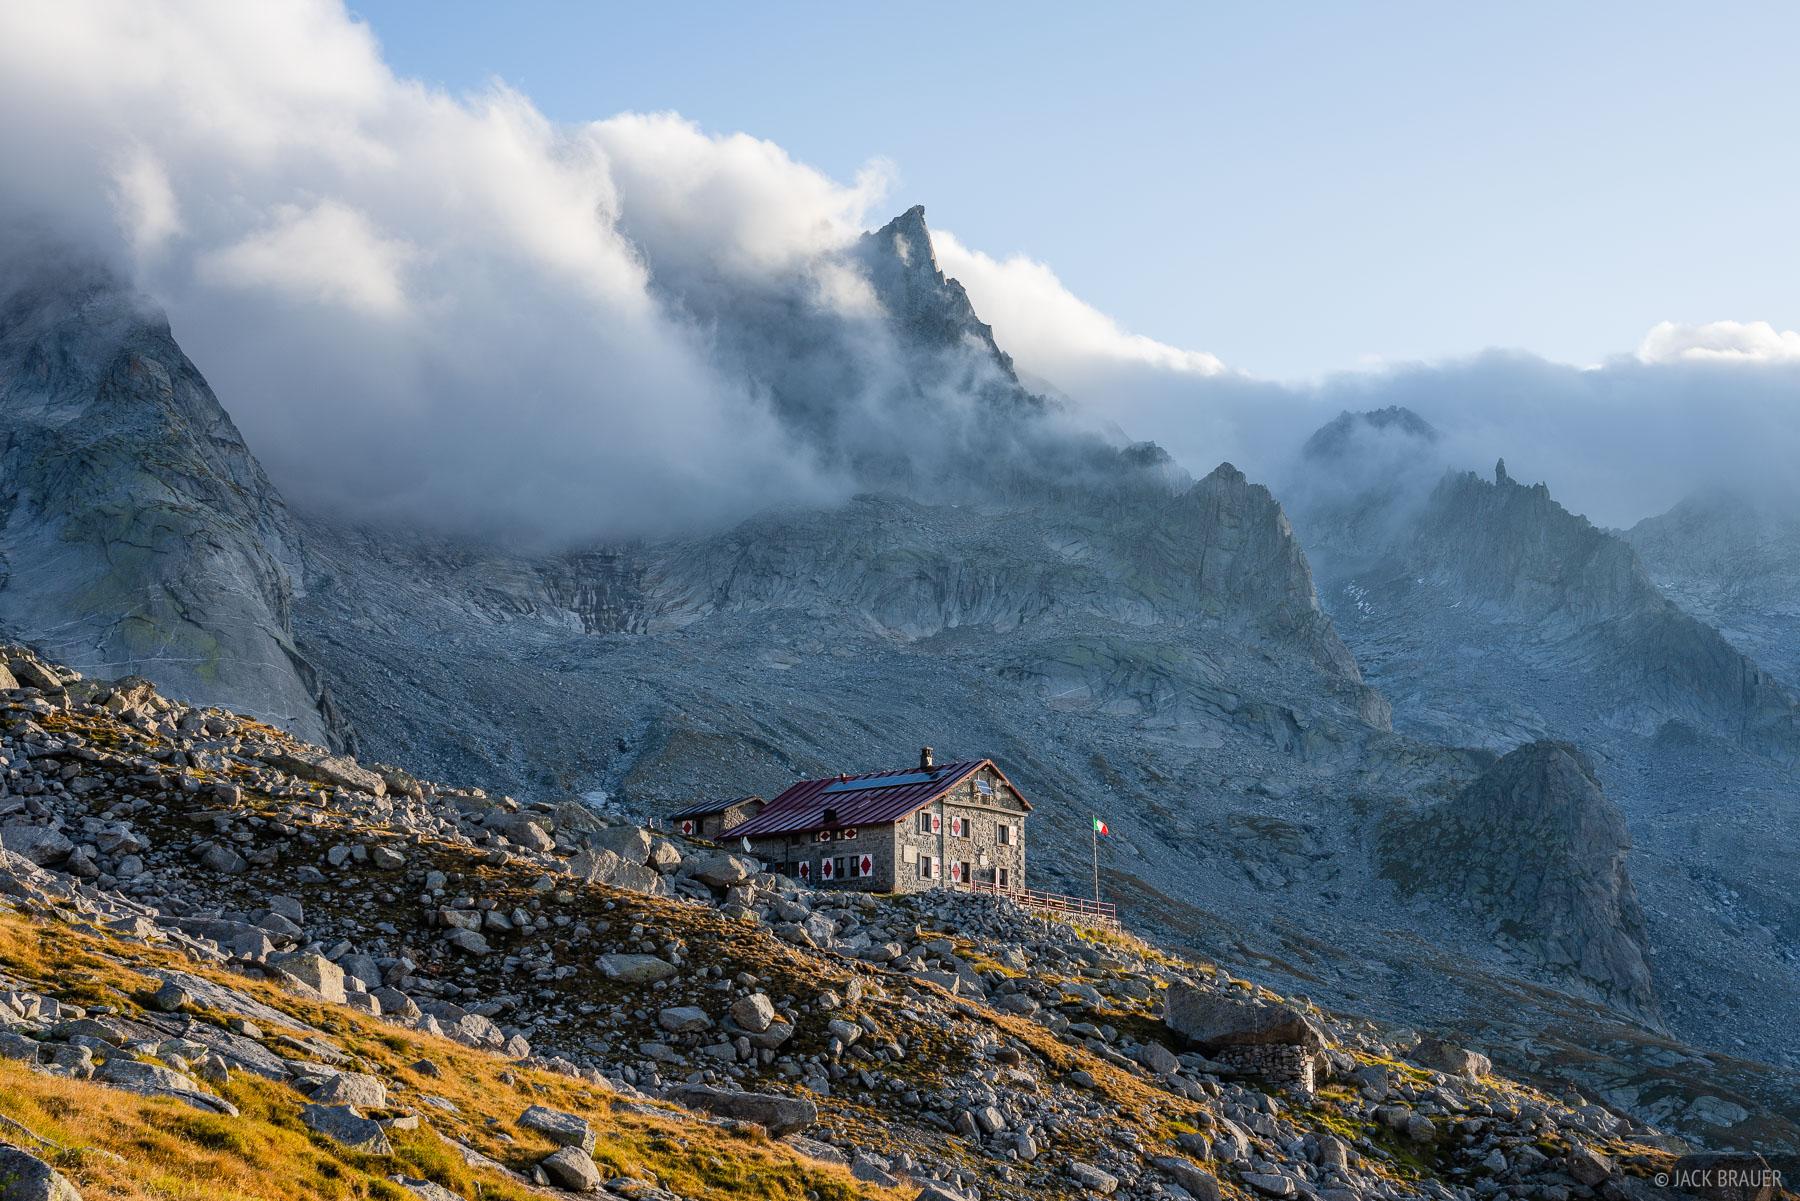 Italy, Pizzo Cengalo, Rhaetian Alps, Rifugio Gianetti, Val Masino, Valle Porcellizzo, hut, photo